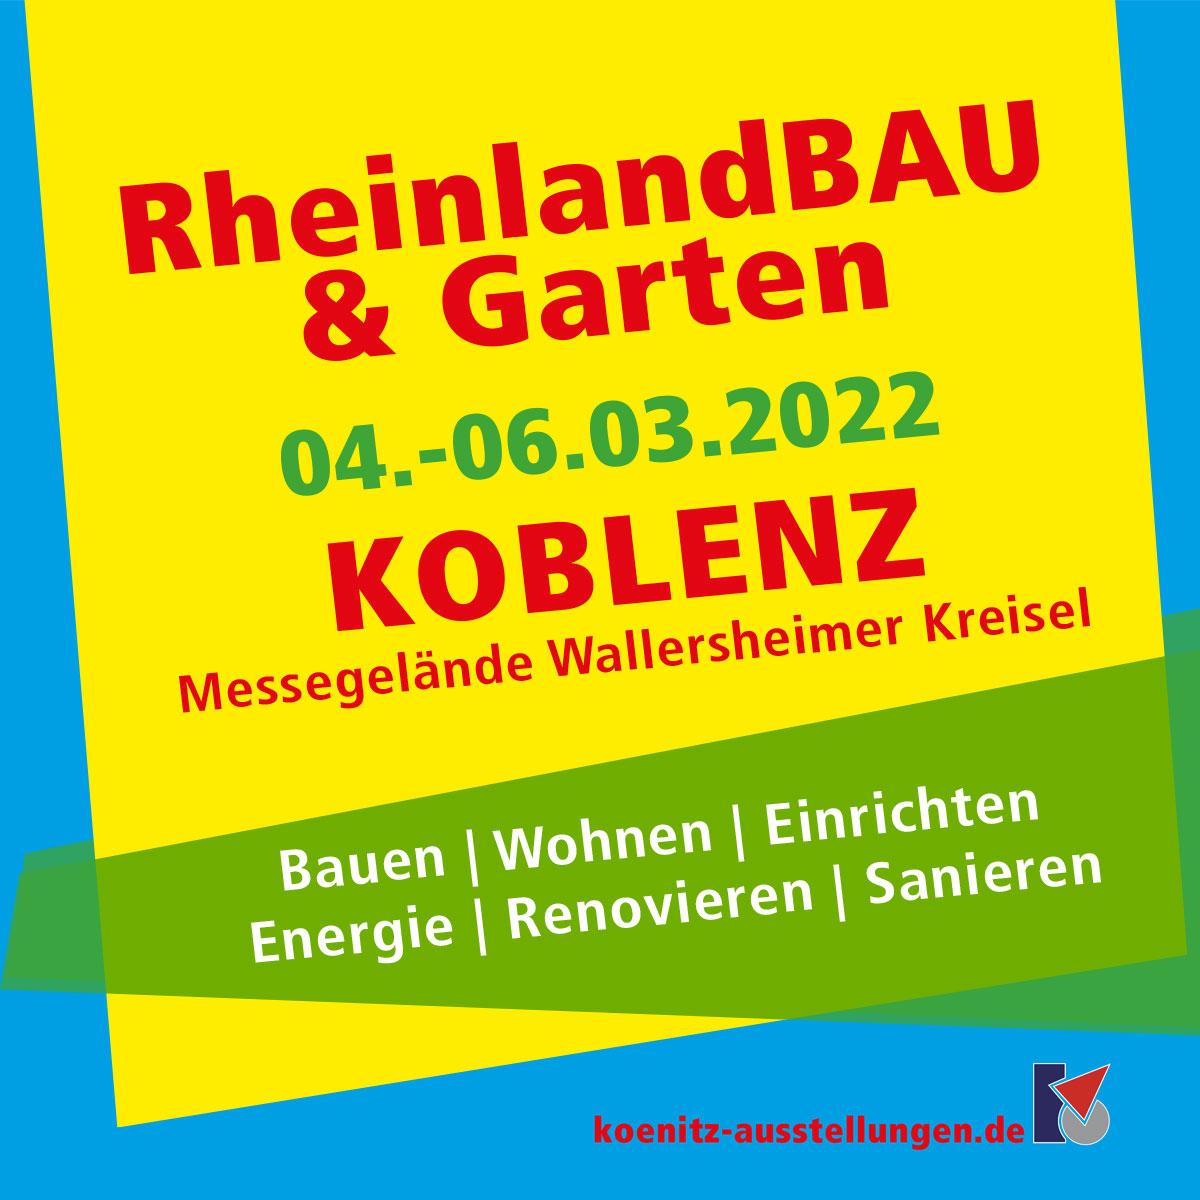 Logo Koenitz-RheinlandBAU 2022